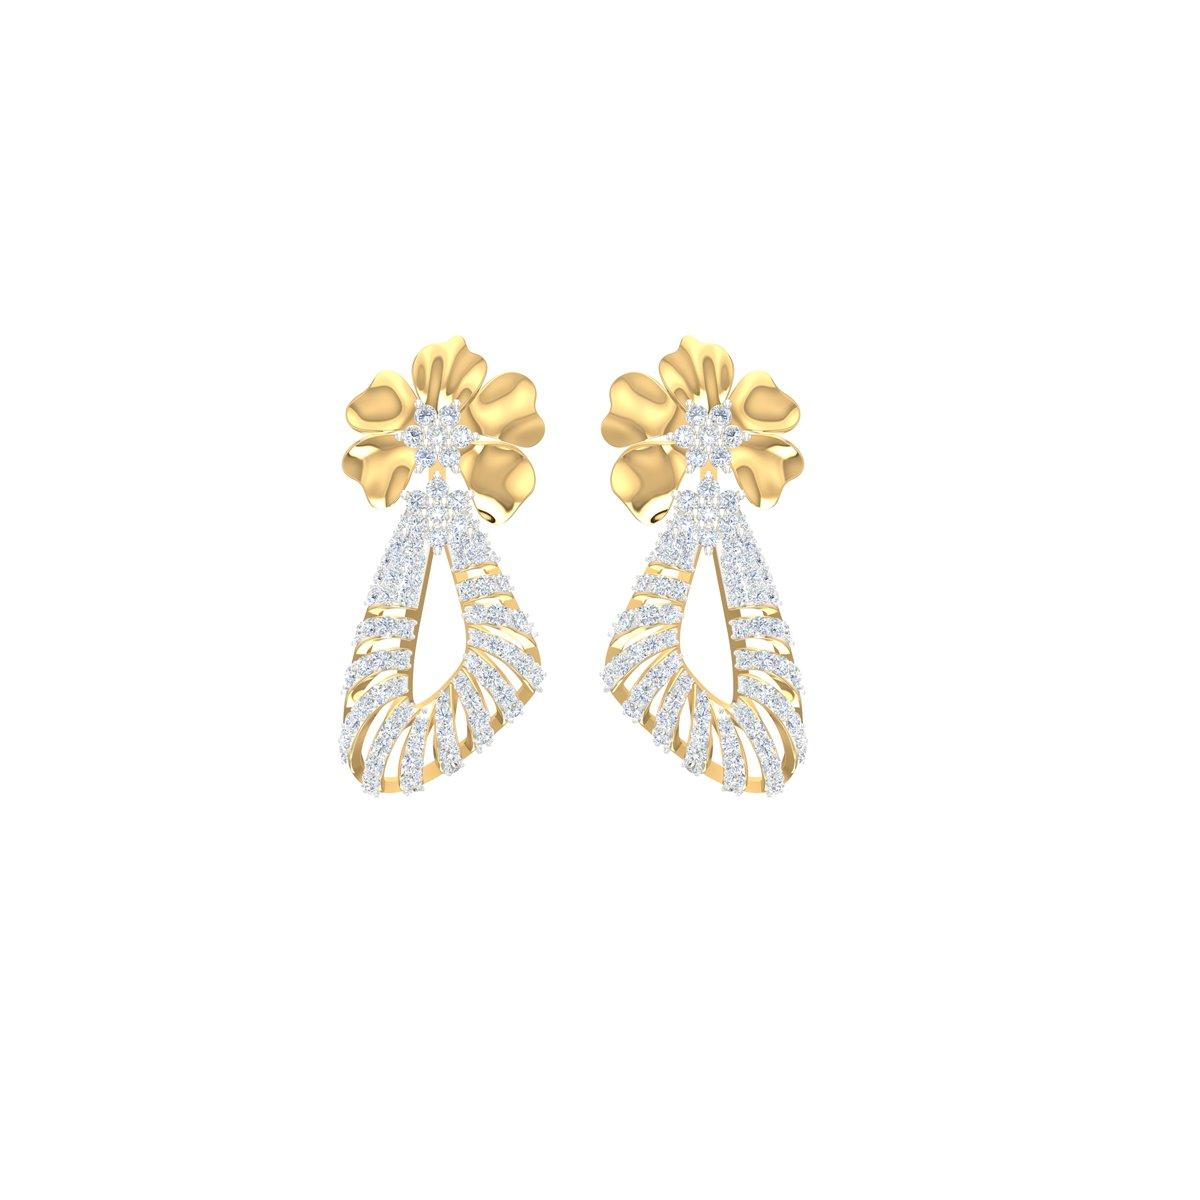 Bellerose Diamond Earrings